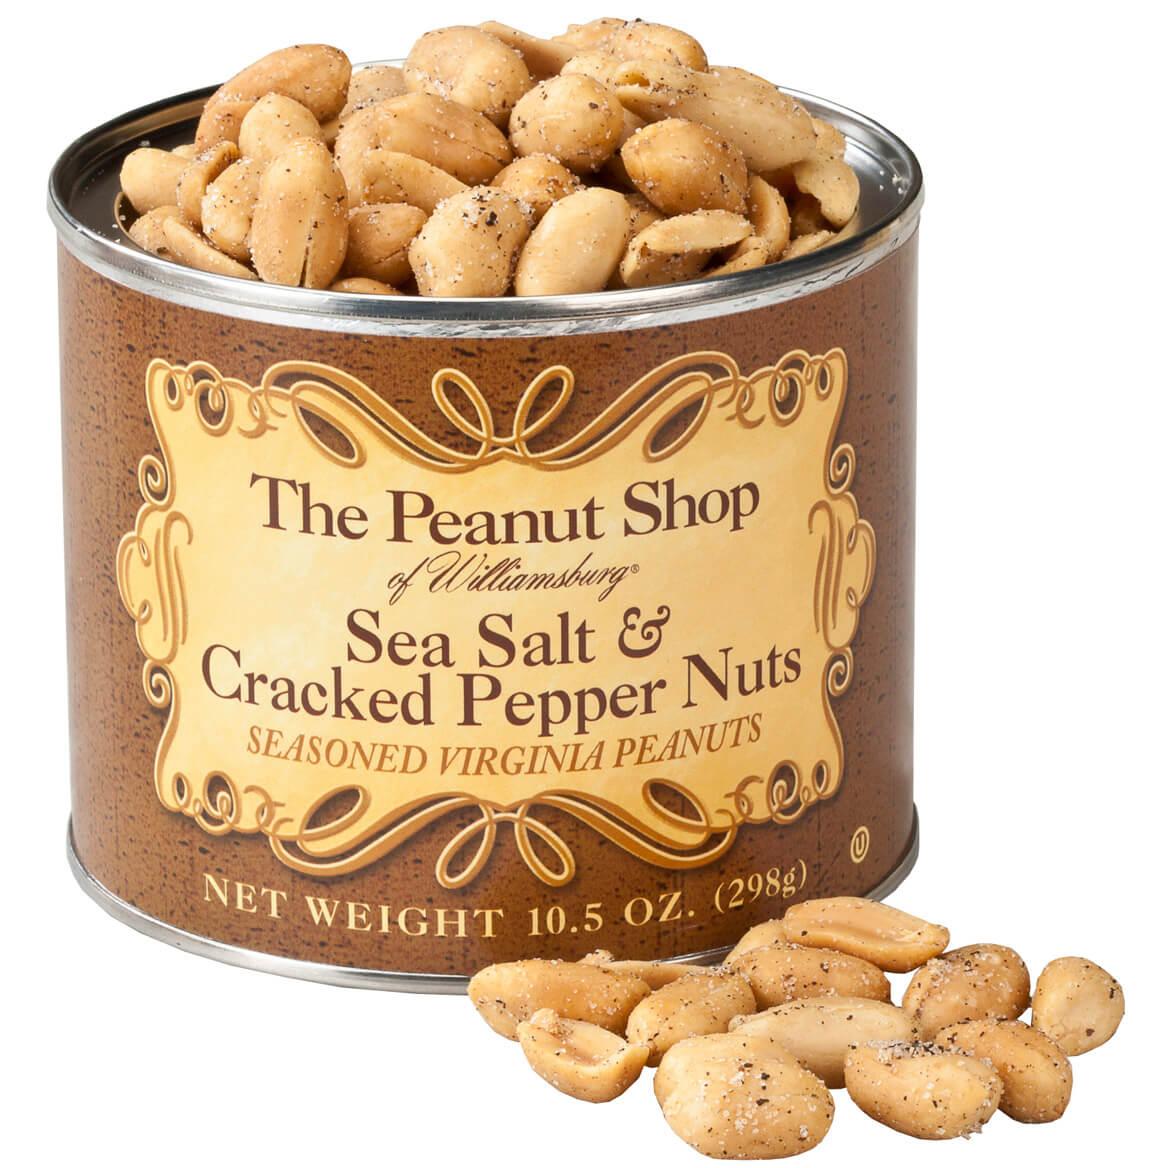 The Peanut Shop® Sea Salt & Cracked Pepper Peanuts, 10.5oz.